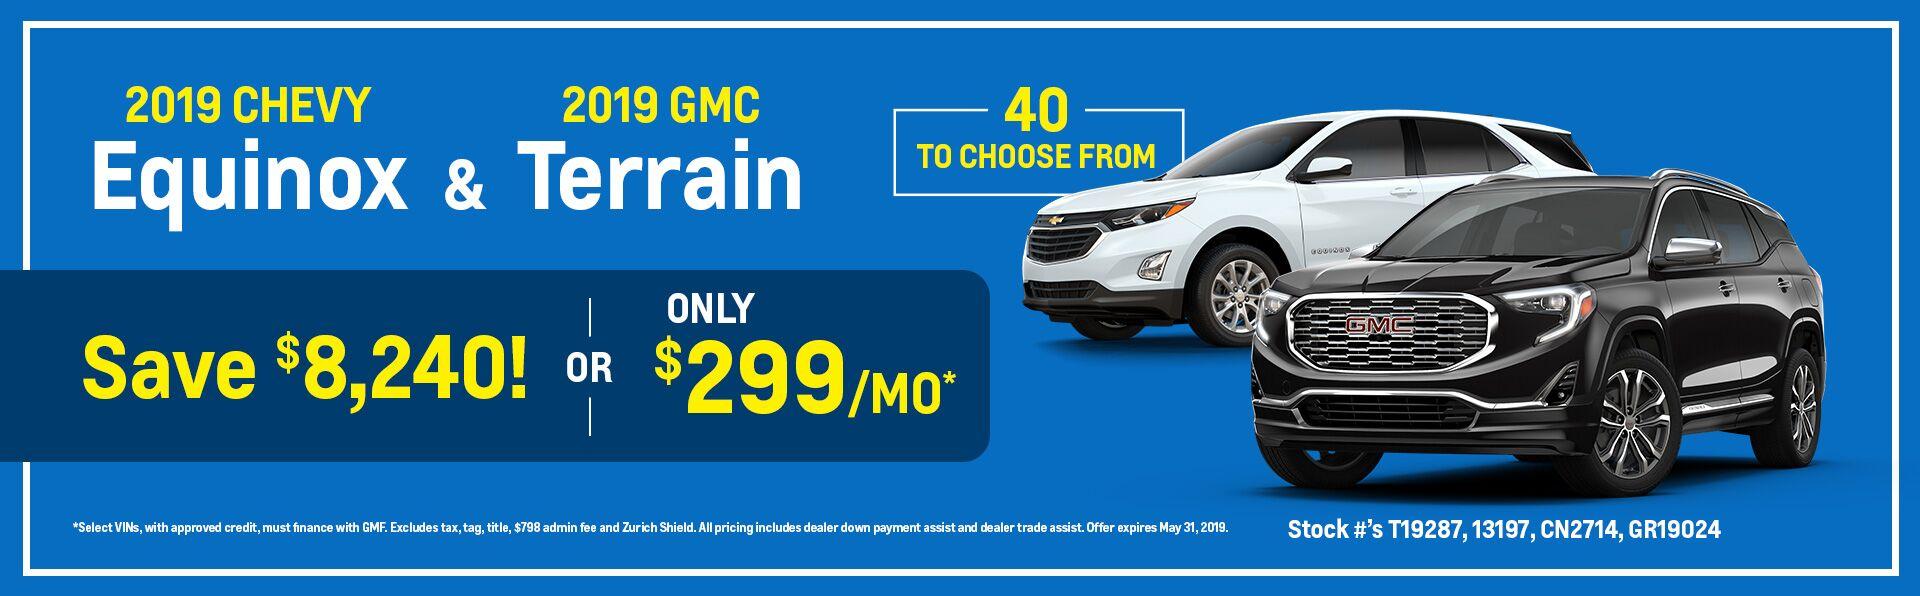 Gmc Dealership Charlotte Nc >> Chevrolet, Buick and GMC Dealer in Salisbury - Serving ...